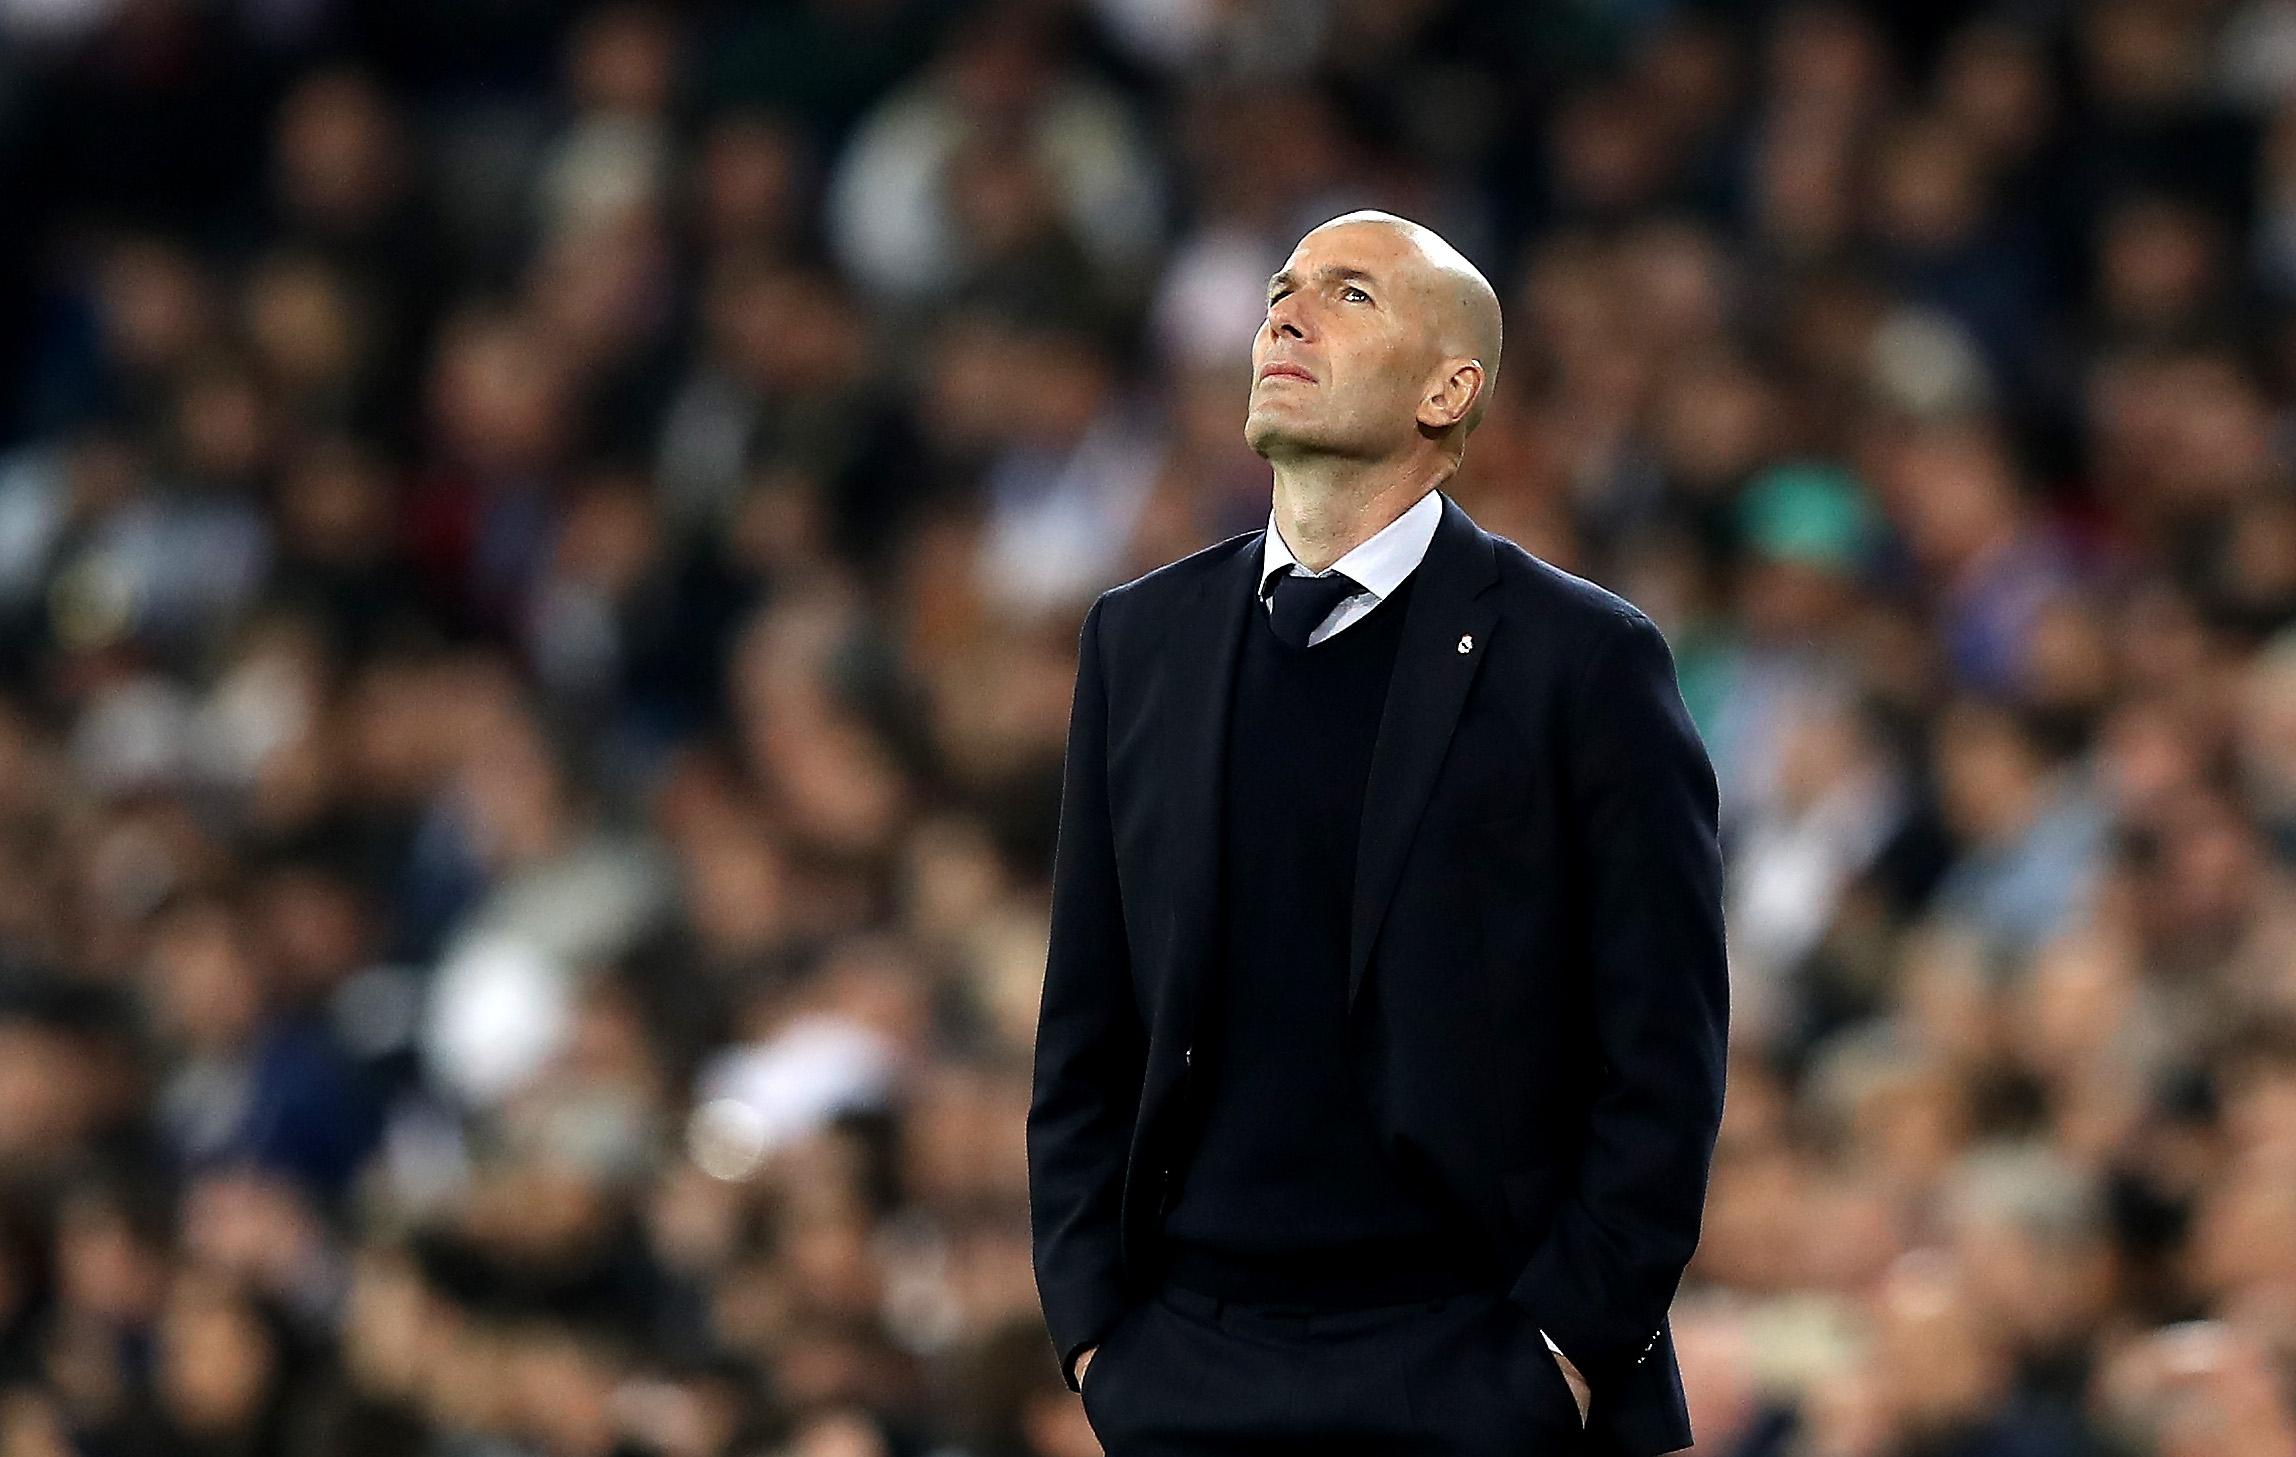 Старши треньорът на Реал Мадрид Зинедин Зидан е нарушил разпоредбите